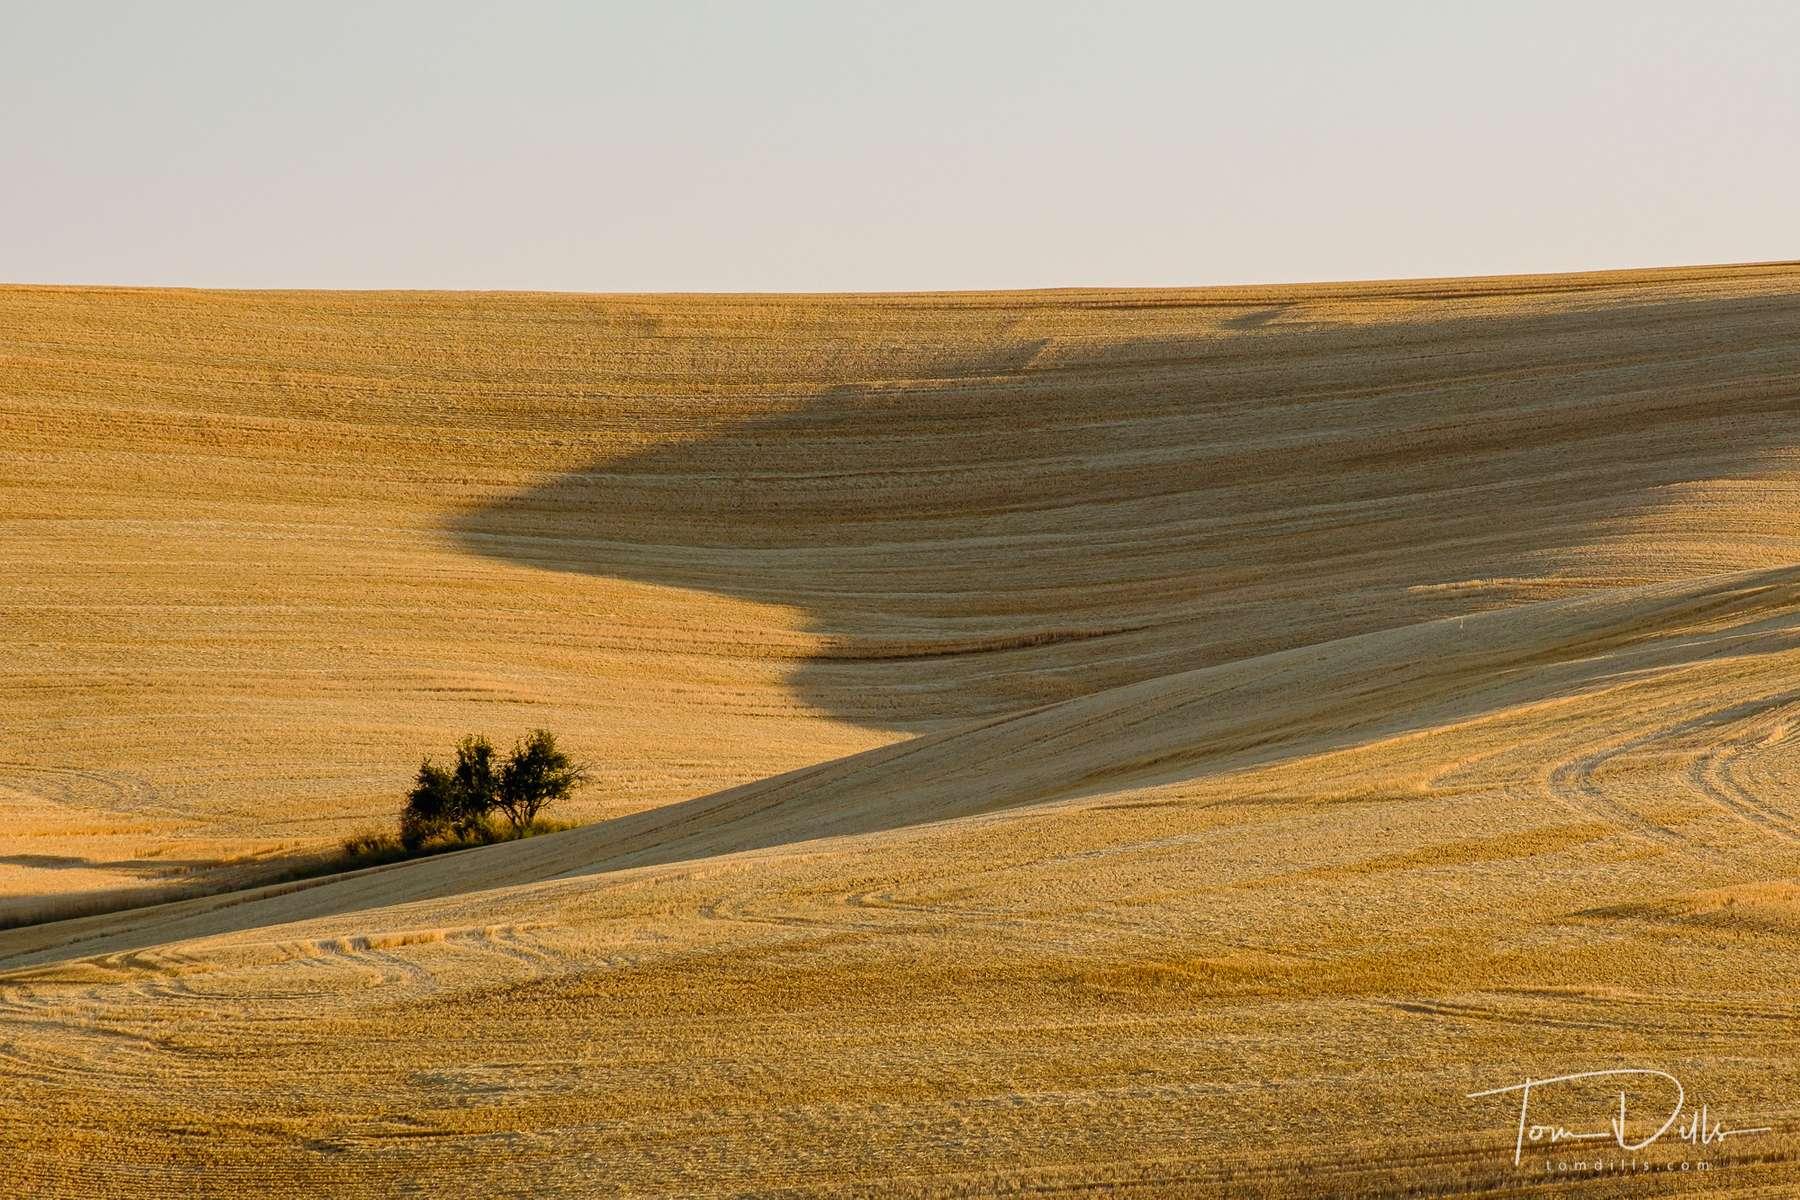 Rural scenery in The Palouse area of eastern Washington north of Pullman, Washington